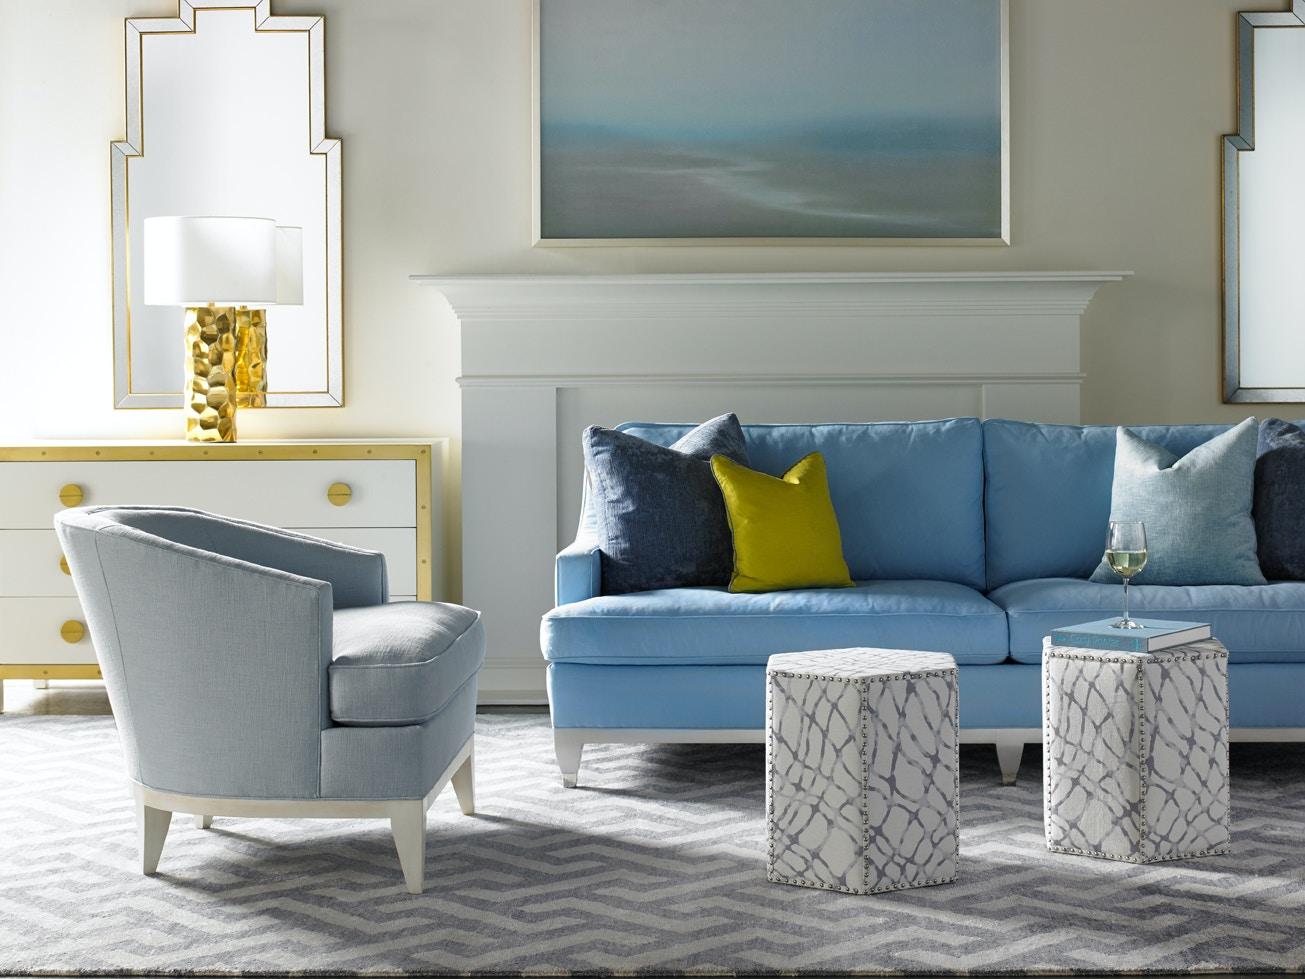 lillian august furniture. lillian august furniture drake sofa la7142s f